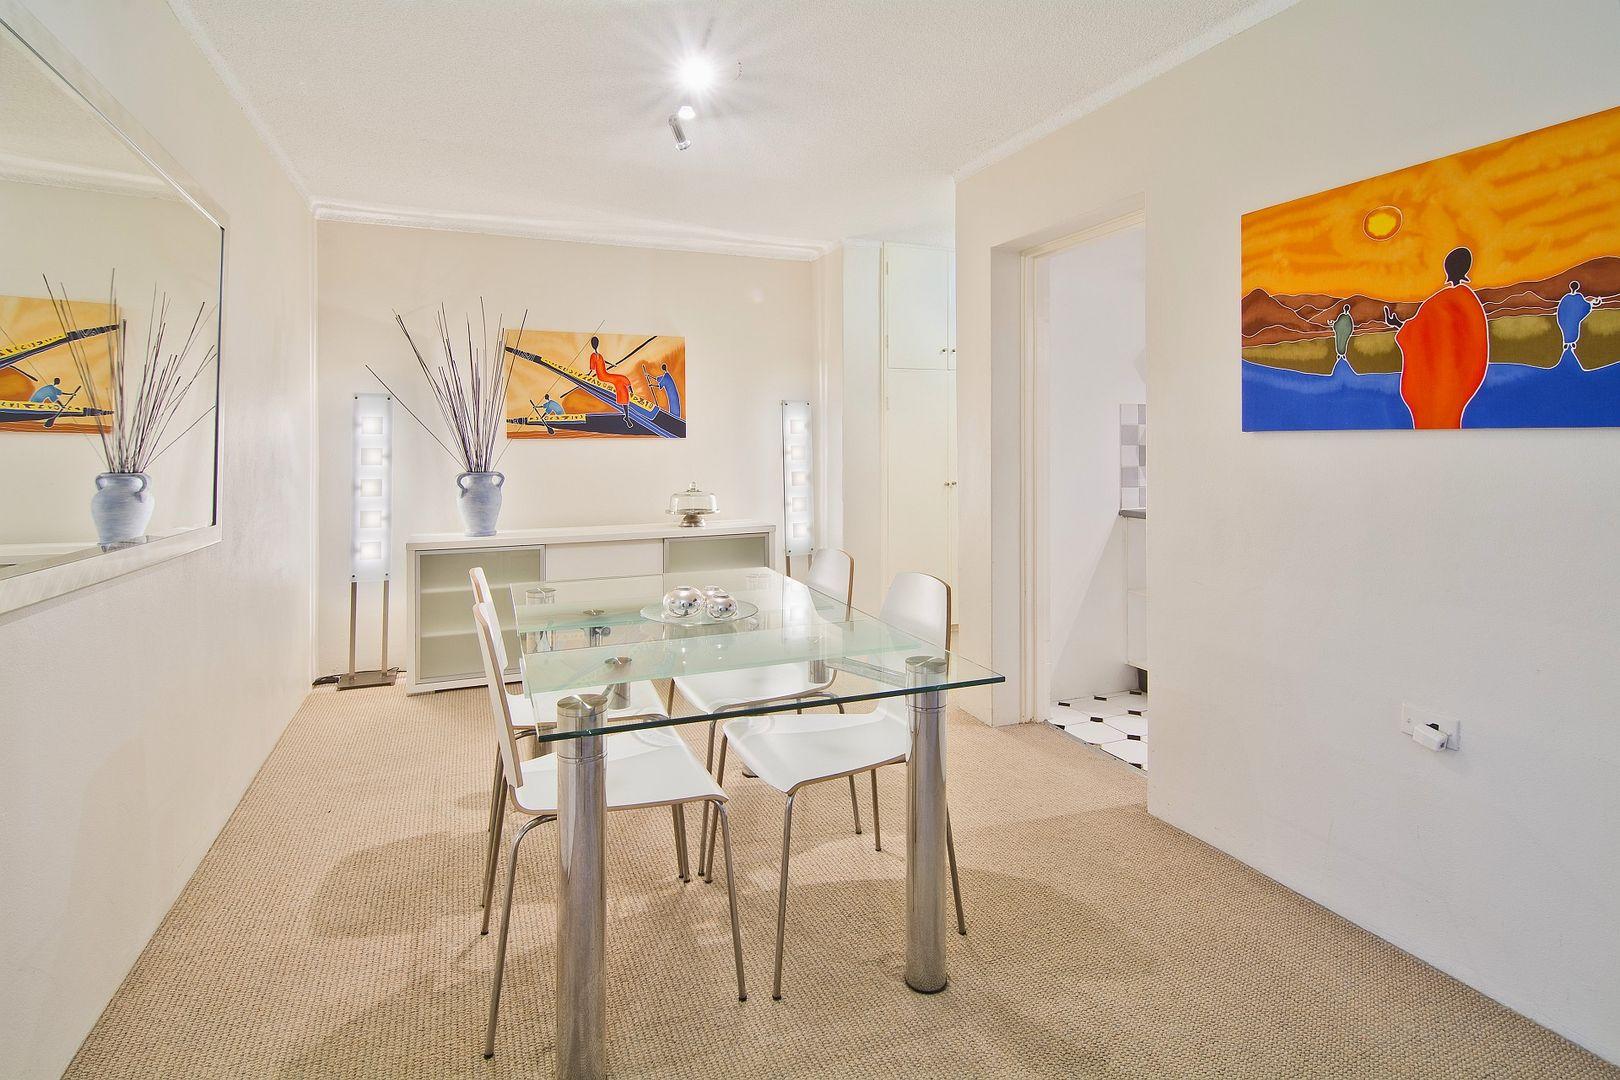 11/400 Mowbray Road, Lane Cove North NSW 2066, Image 1